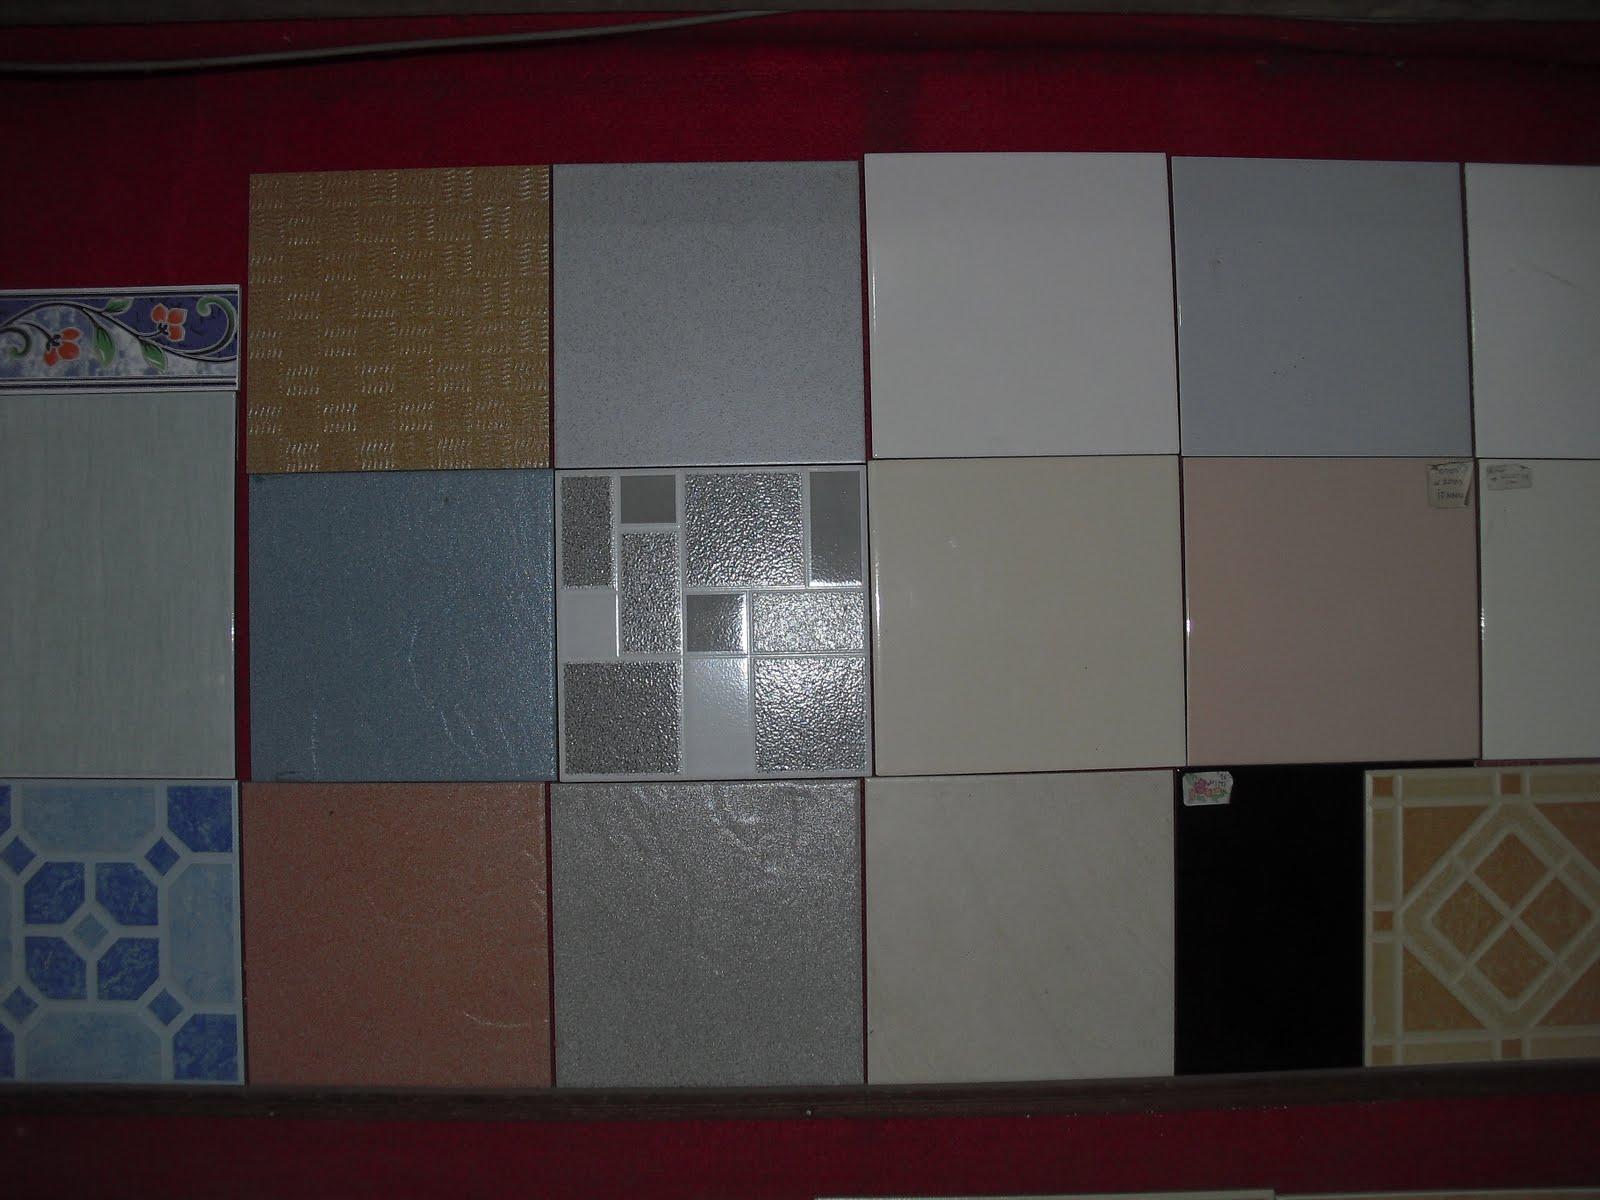 keramik dinding keramik kamar mandi